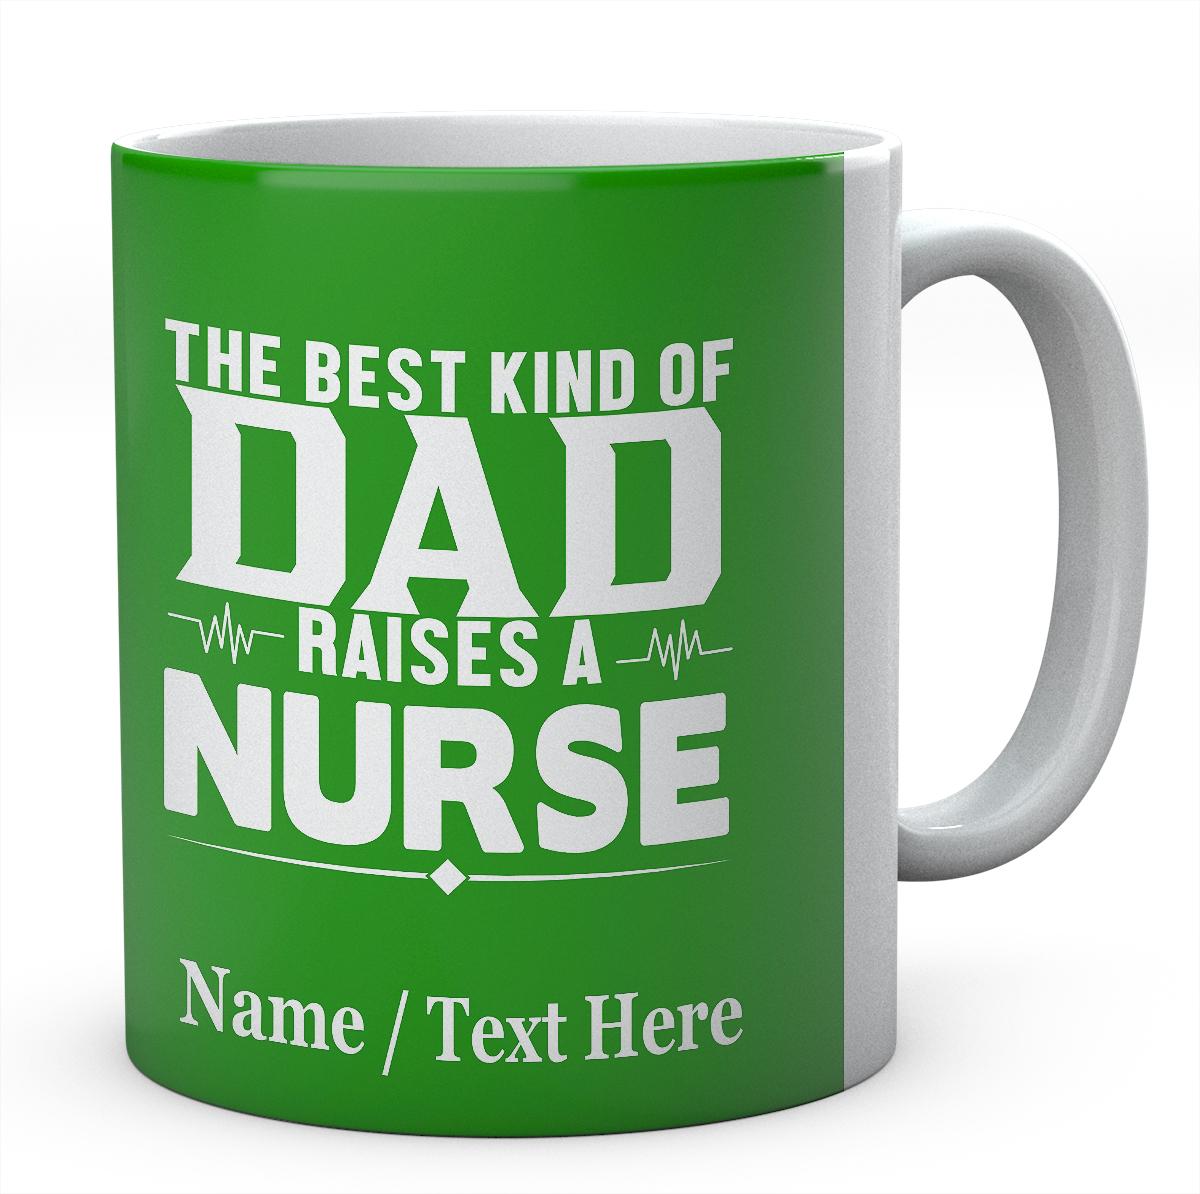 The Best Kind of Dad Raises A Nurse-Novelty Personalised Mug